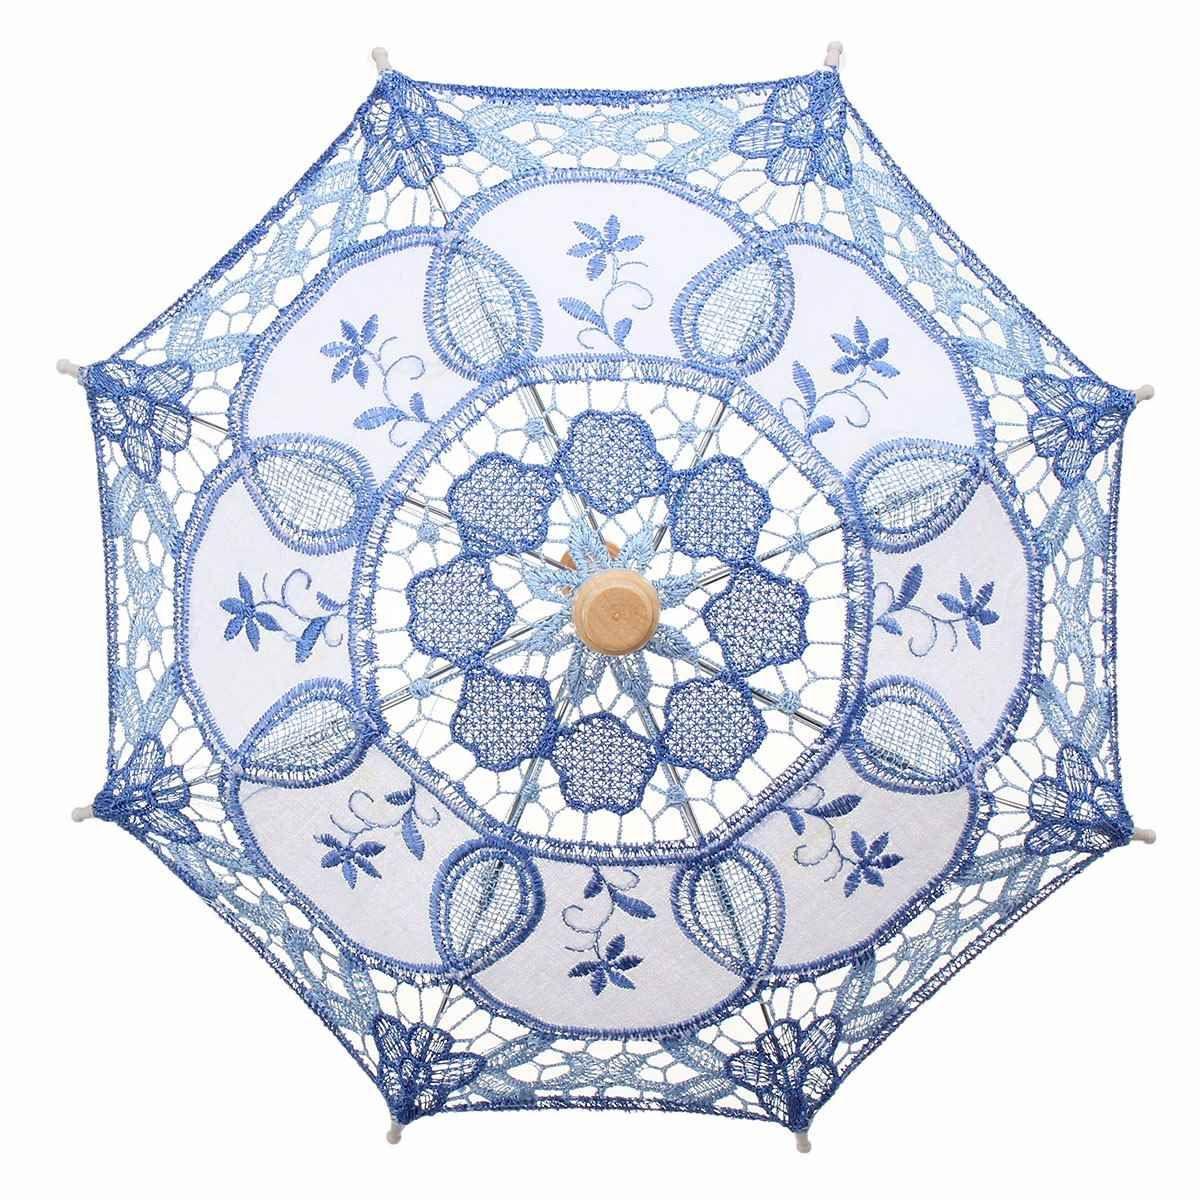 Small Decoration Umbrella for Wedding Party Multicolor Handmade Embroidered Cotton Lace Parasol Decorative Umbrella